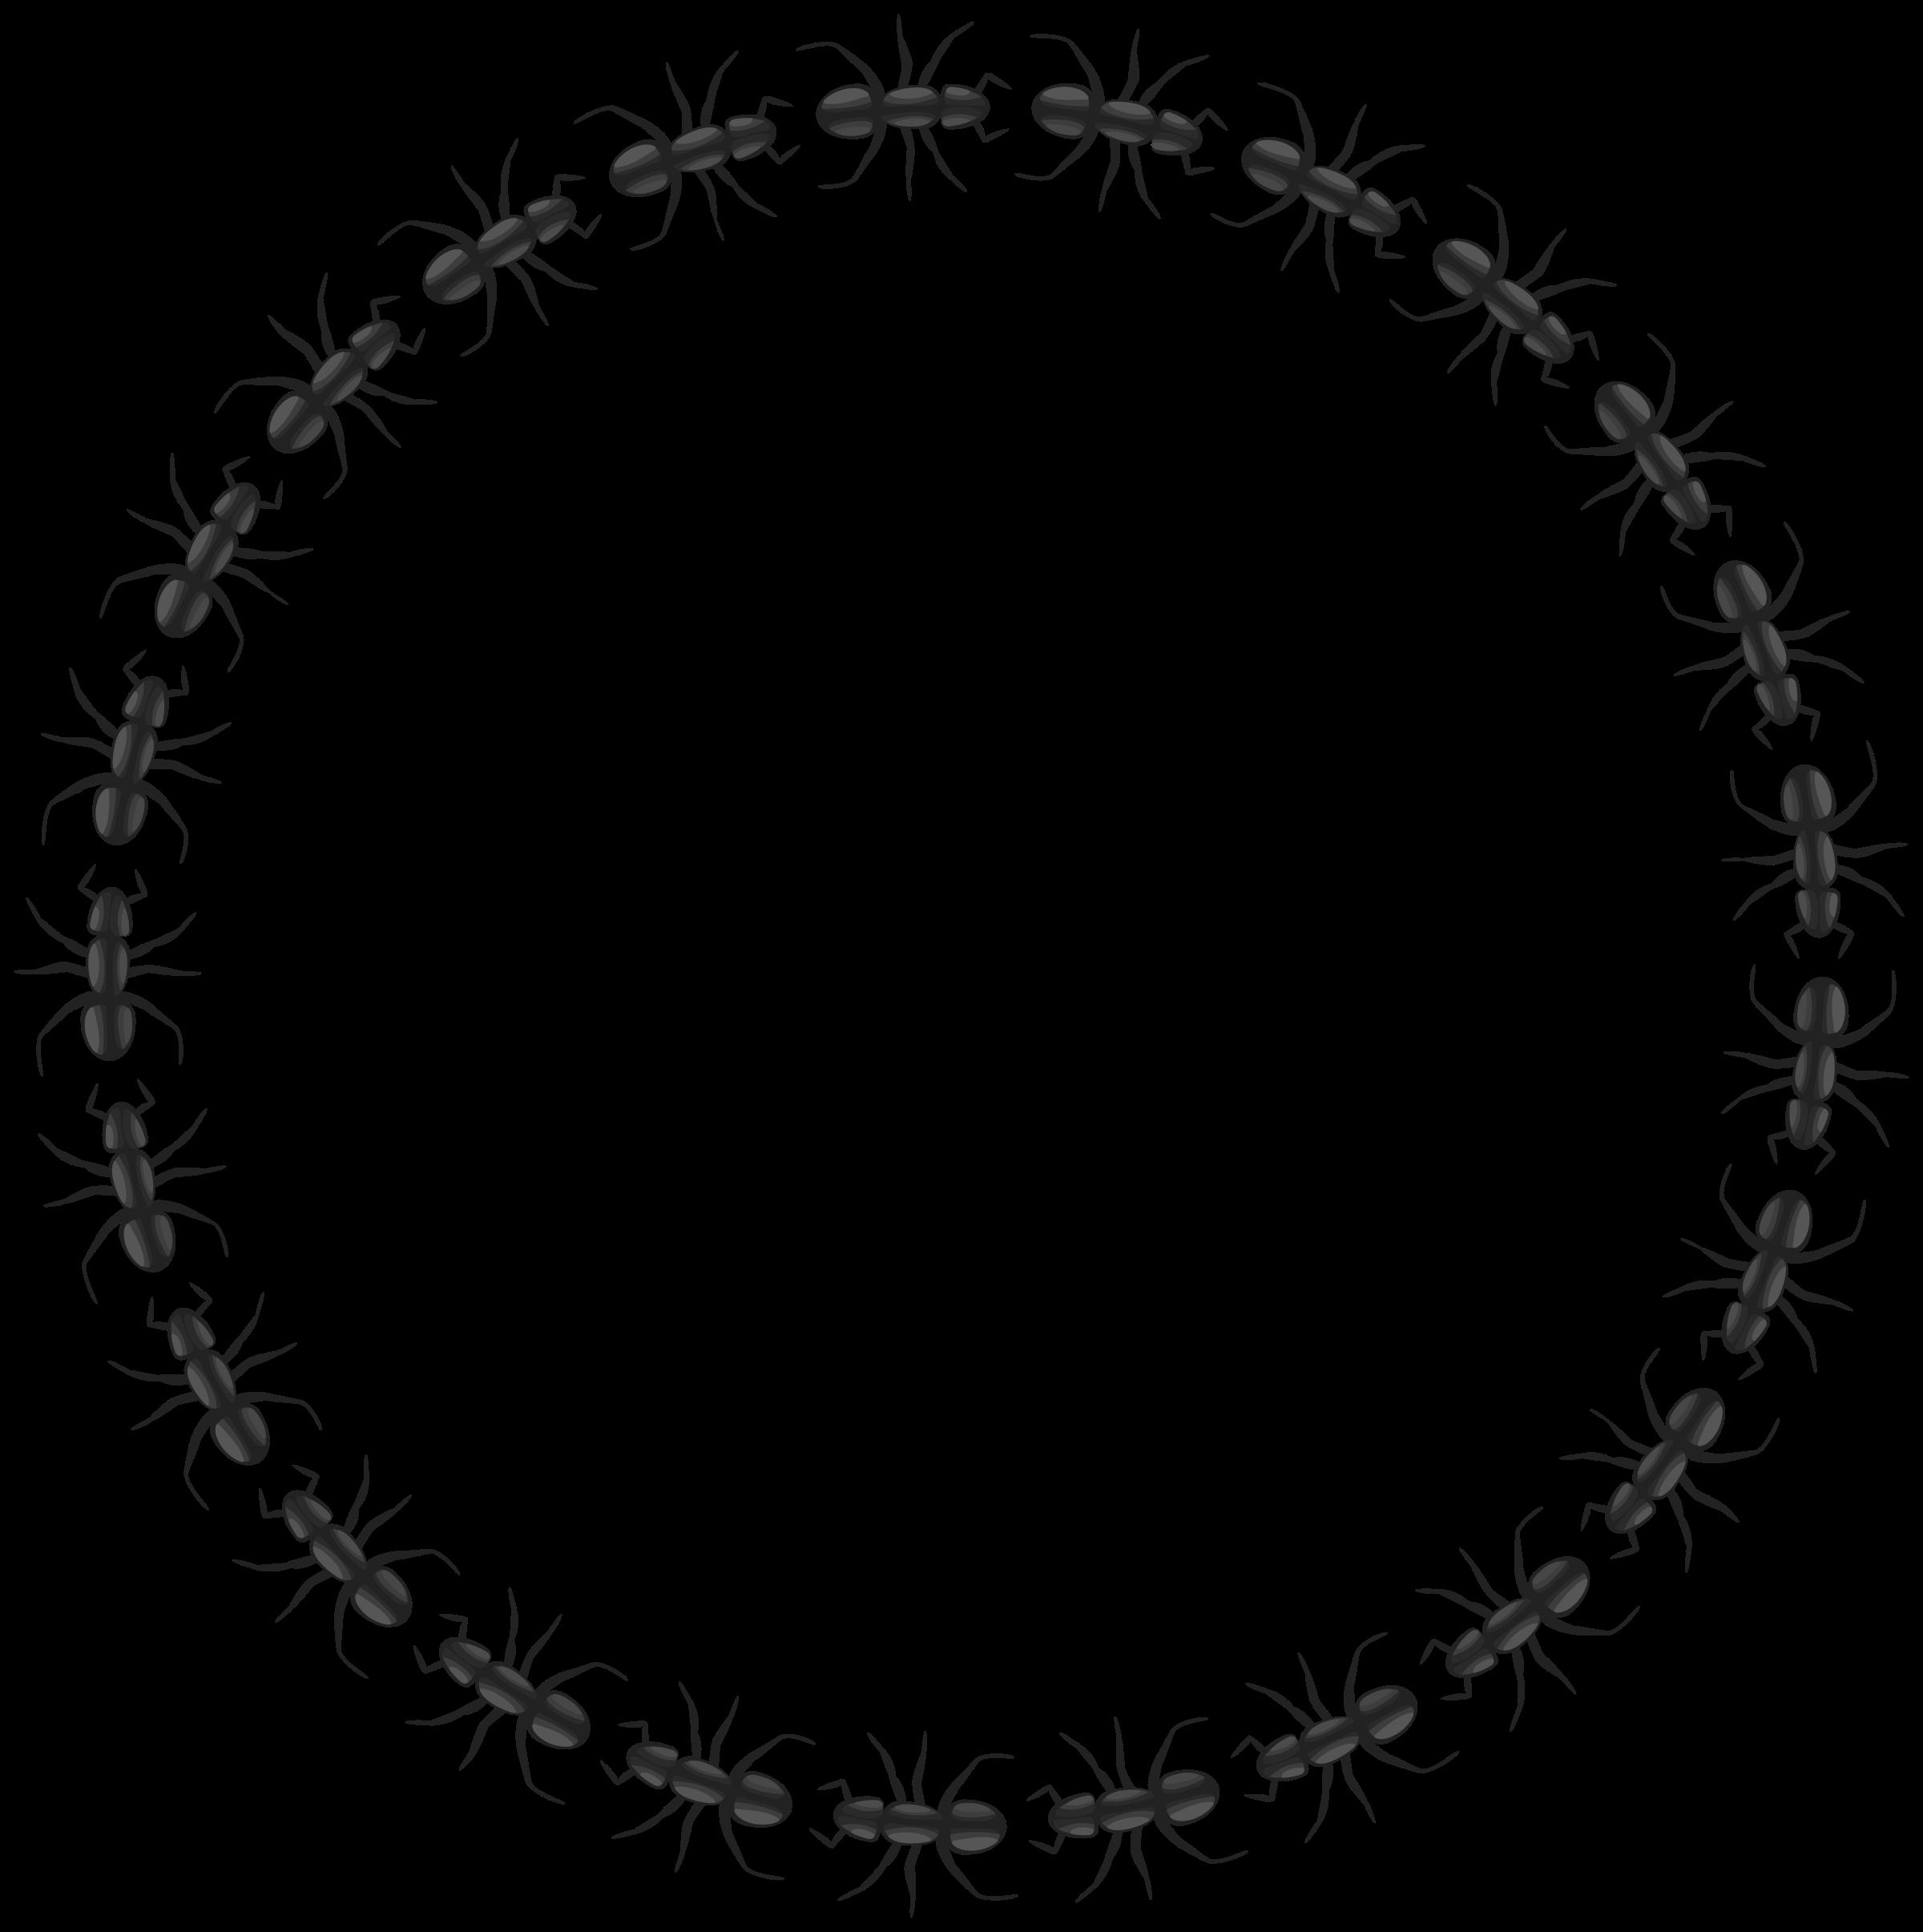 Clipart wedding circle. Ant border big image